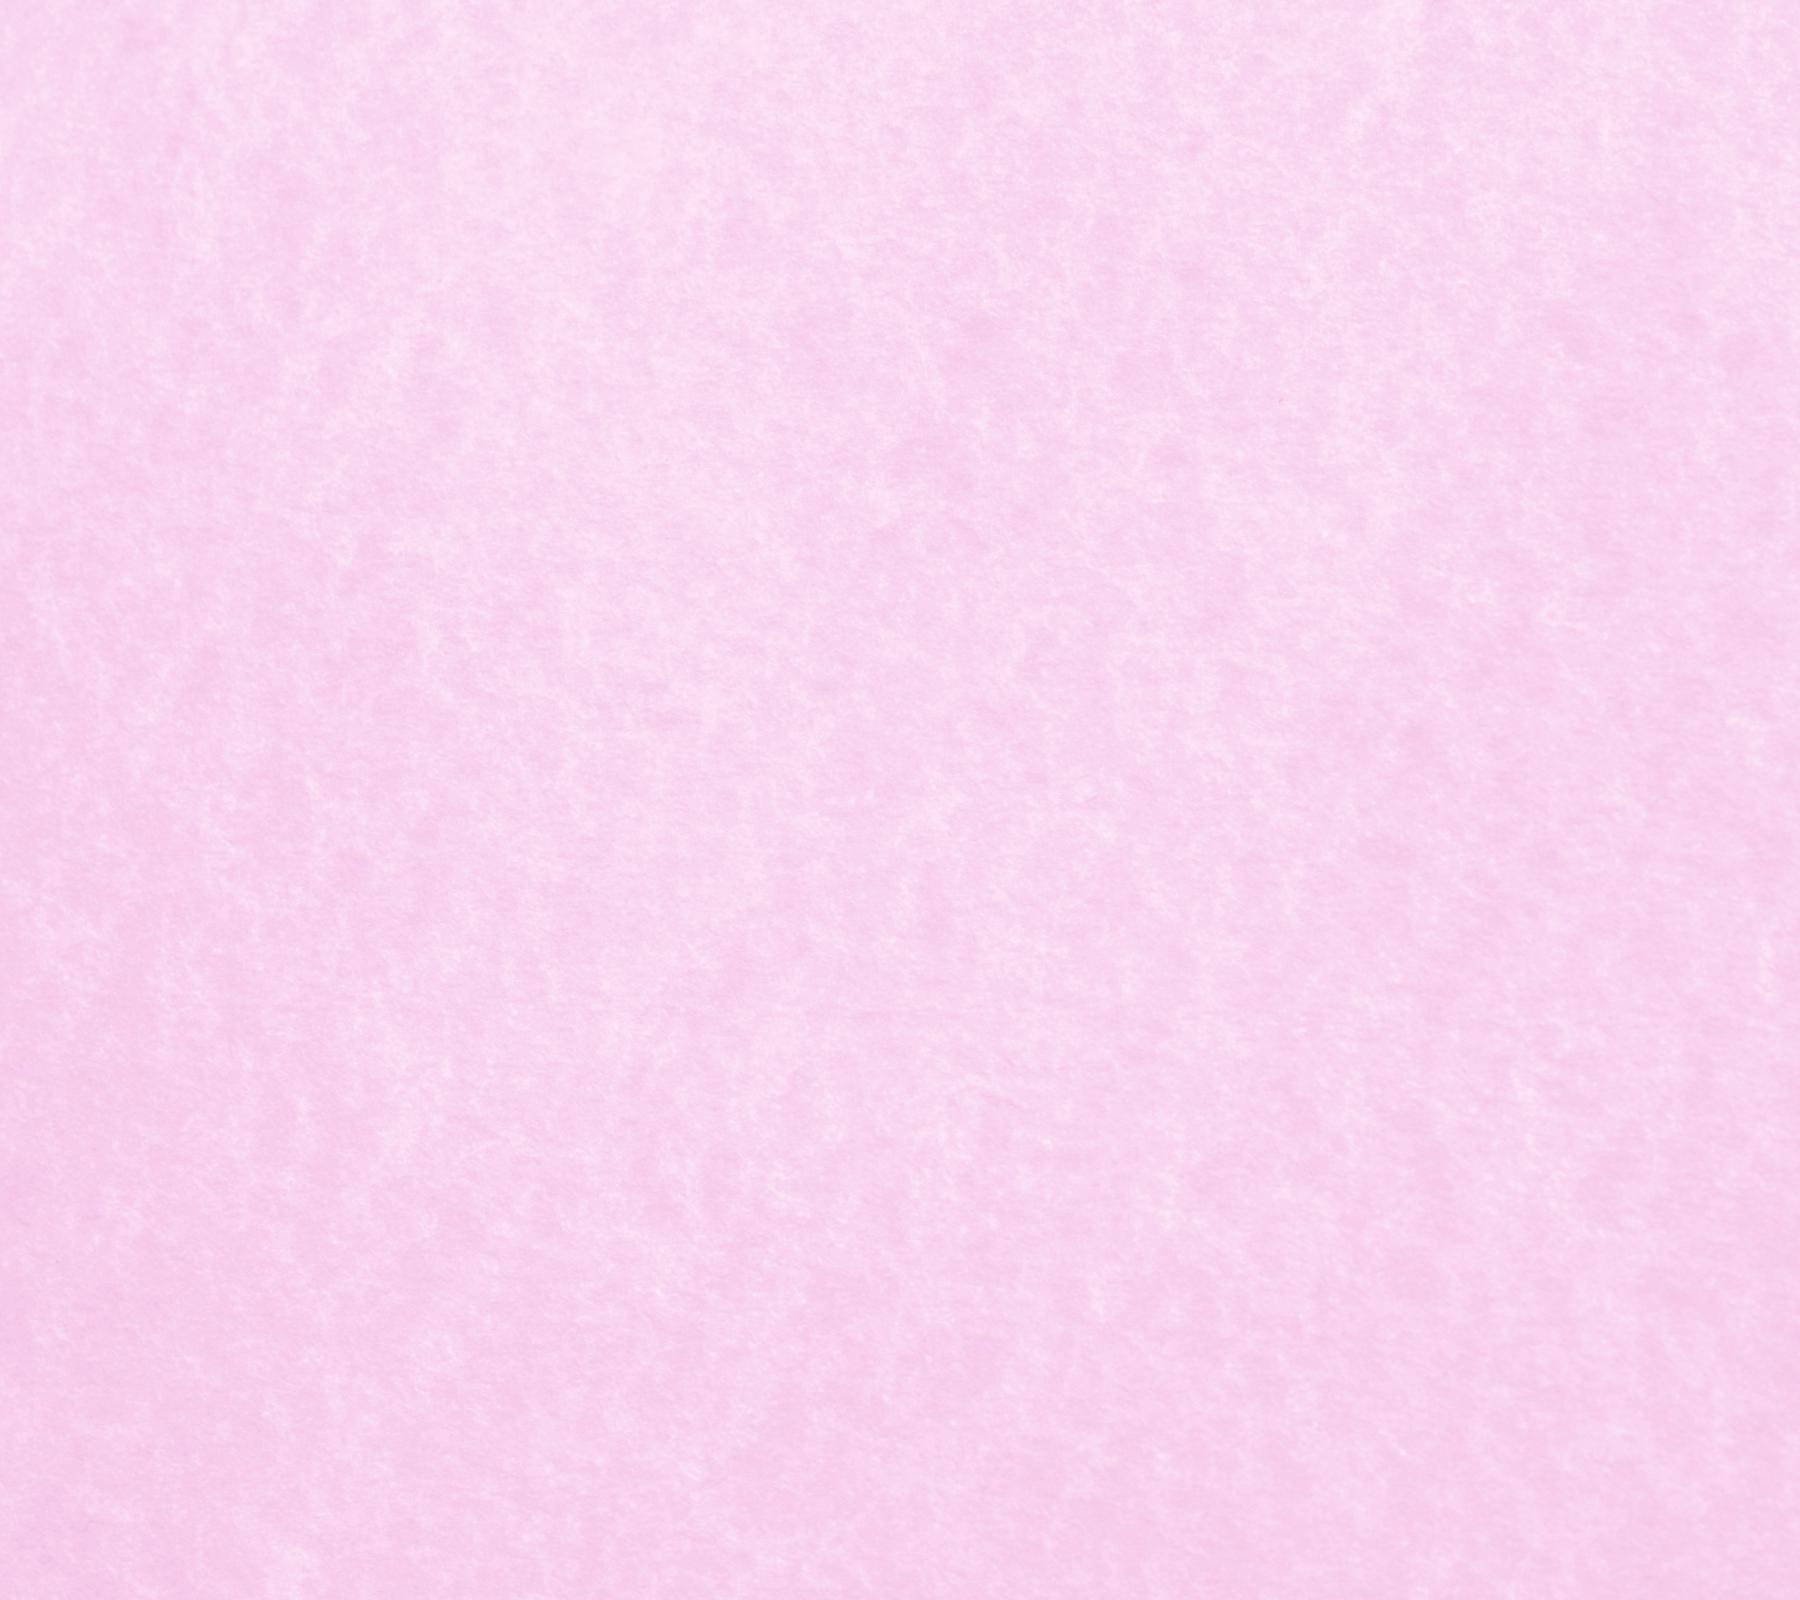 Plain Baby Pink Wallpaper: Plain Pastel Pink Background